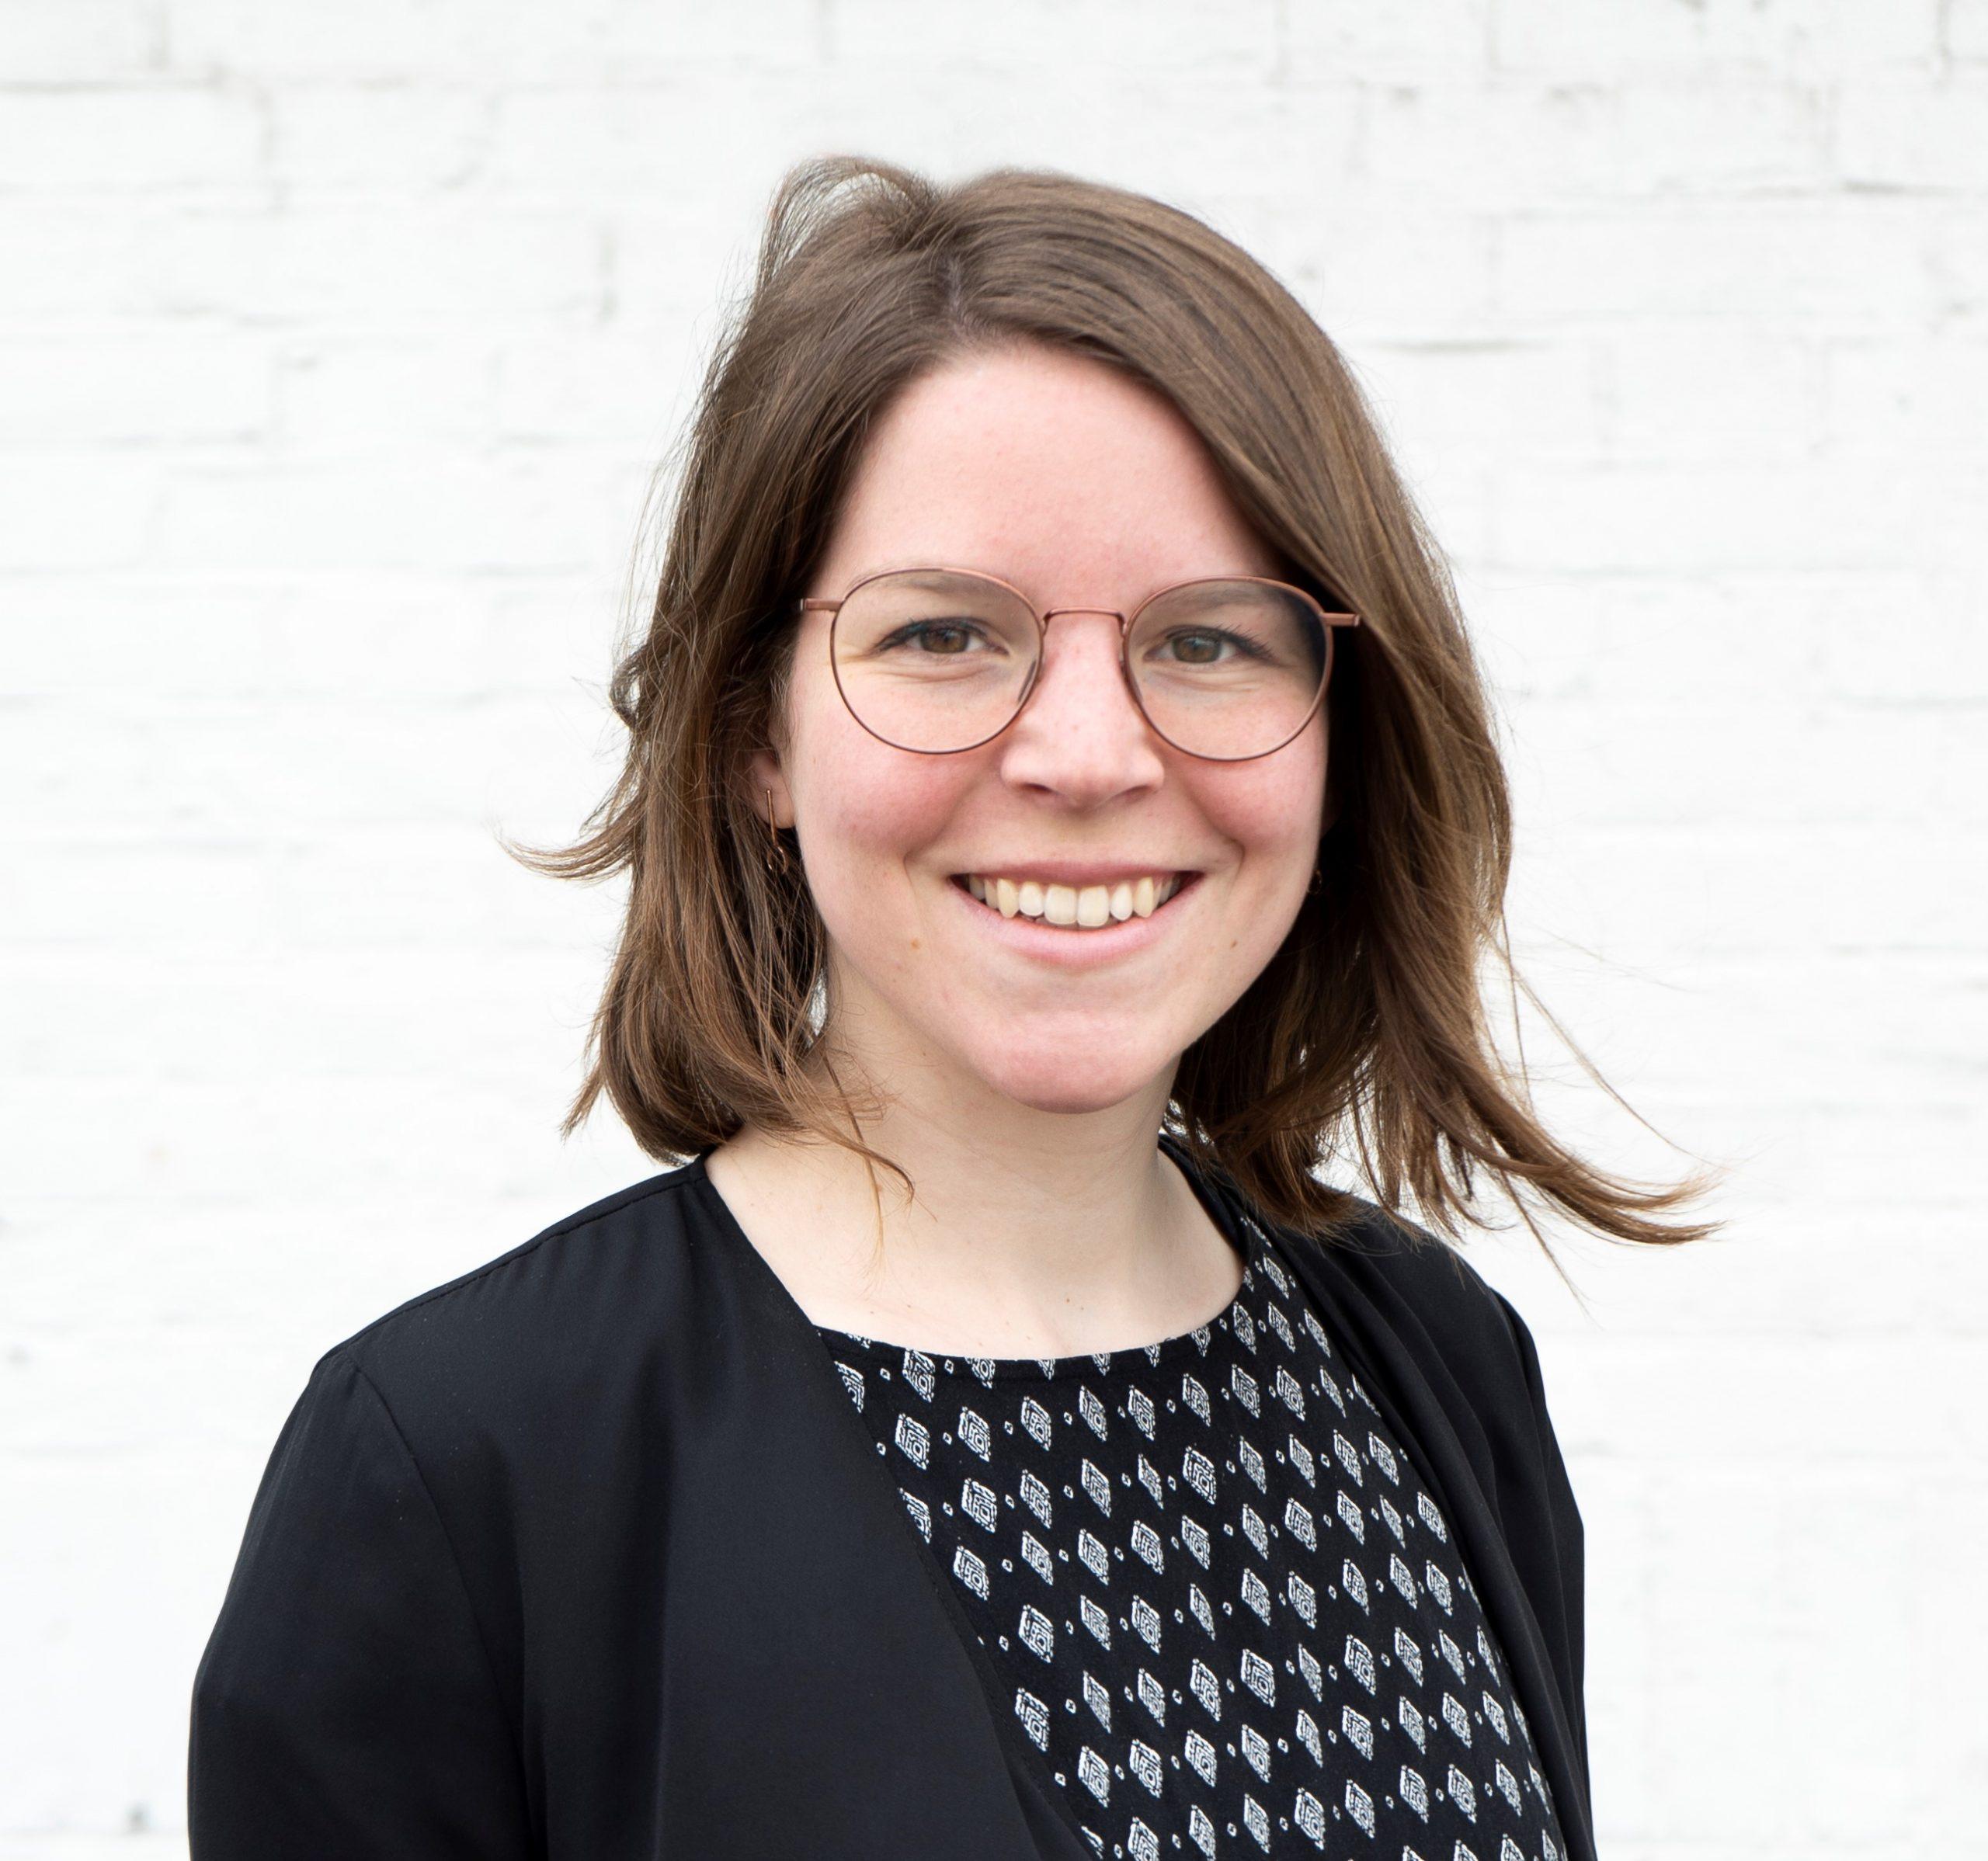 New Activists For Rural Development- Meet Kristin Langer from the Netherlands